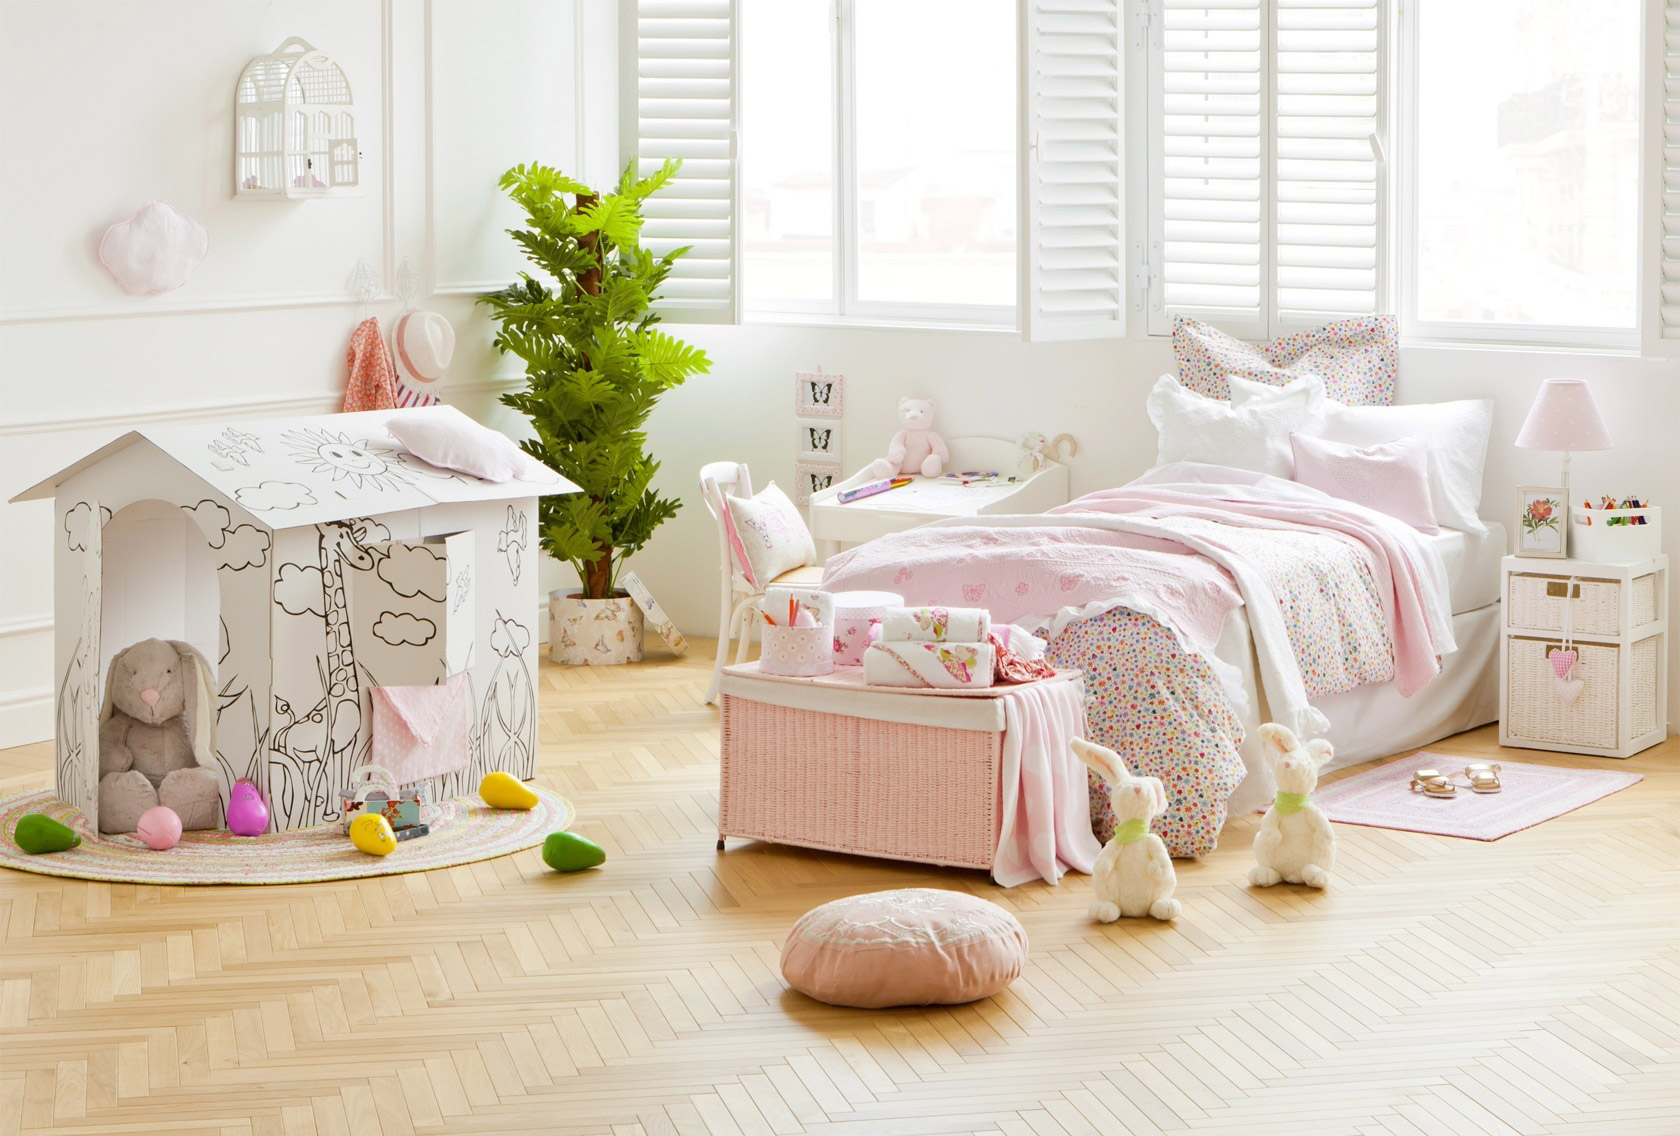 Zara home to open in toronto - Zara Kids Home With Zara Home Kids Colecci N Verano Also Zara Home Kids